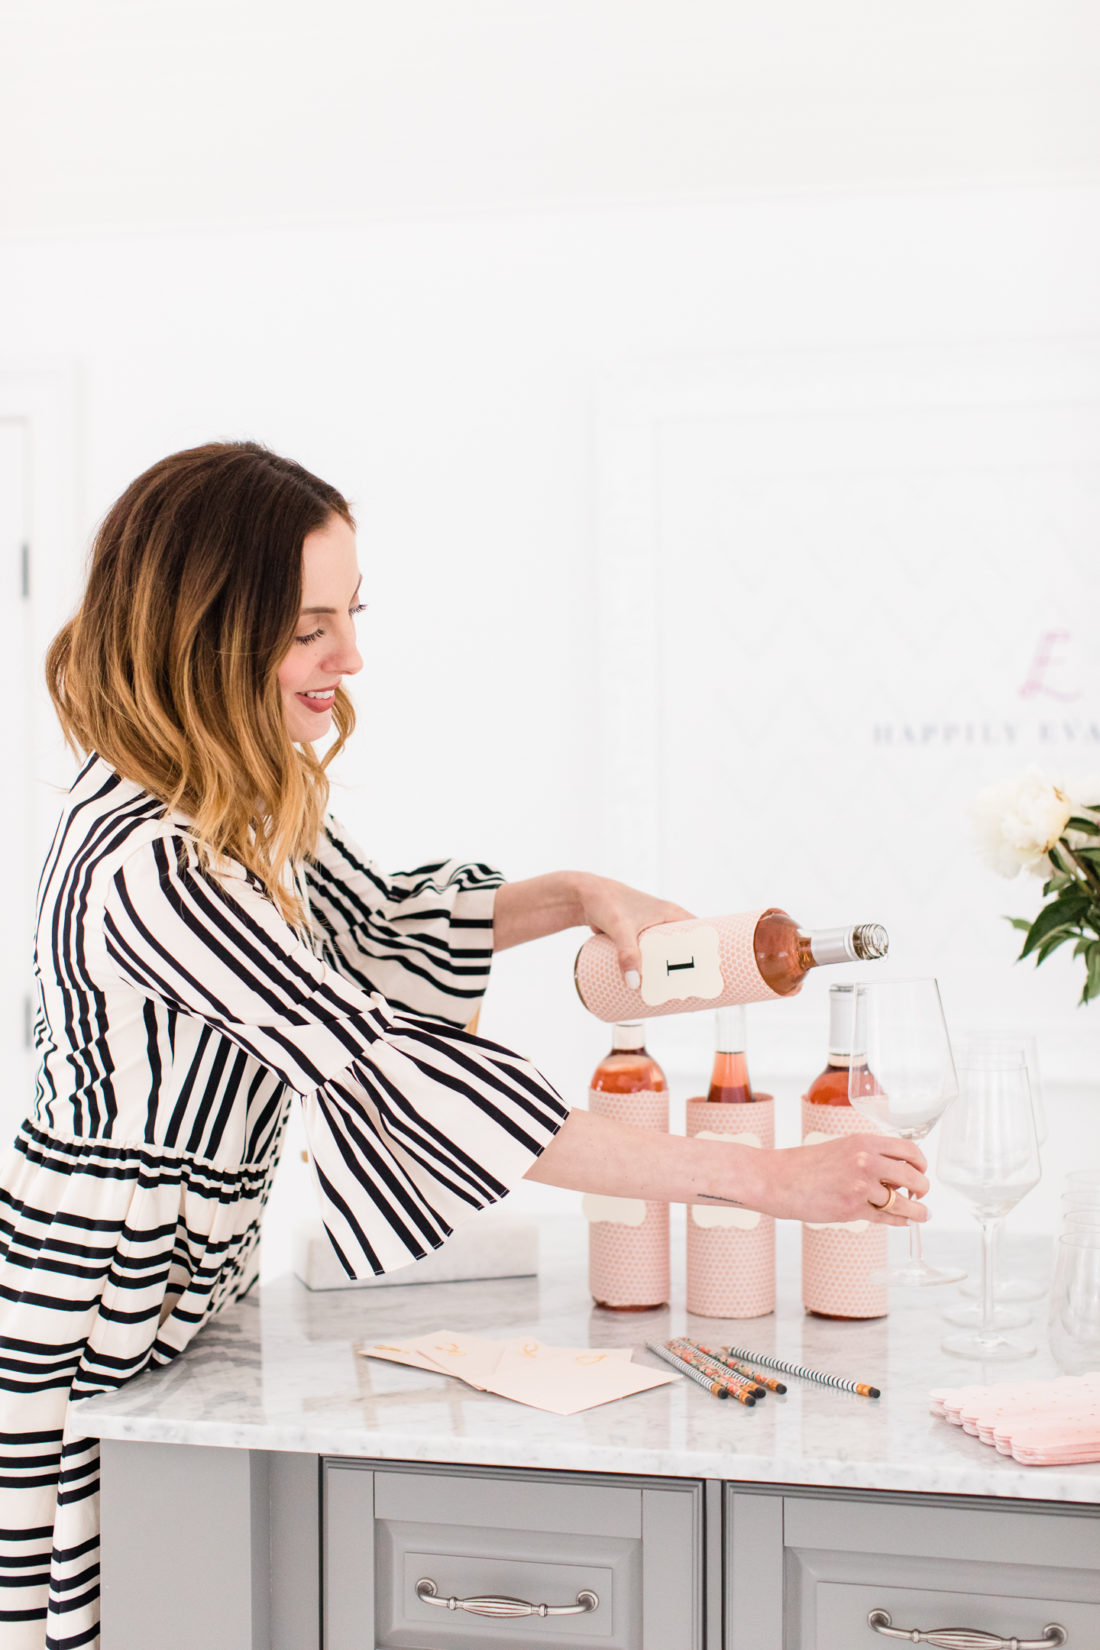 Eva Amurri Martino wears a black and white striped dress and pours a glass of Rosé wine